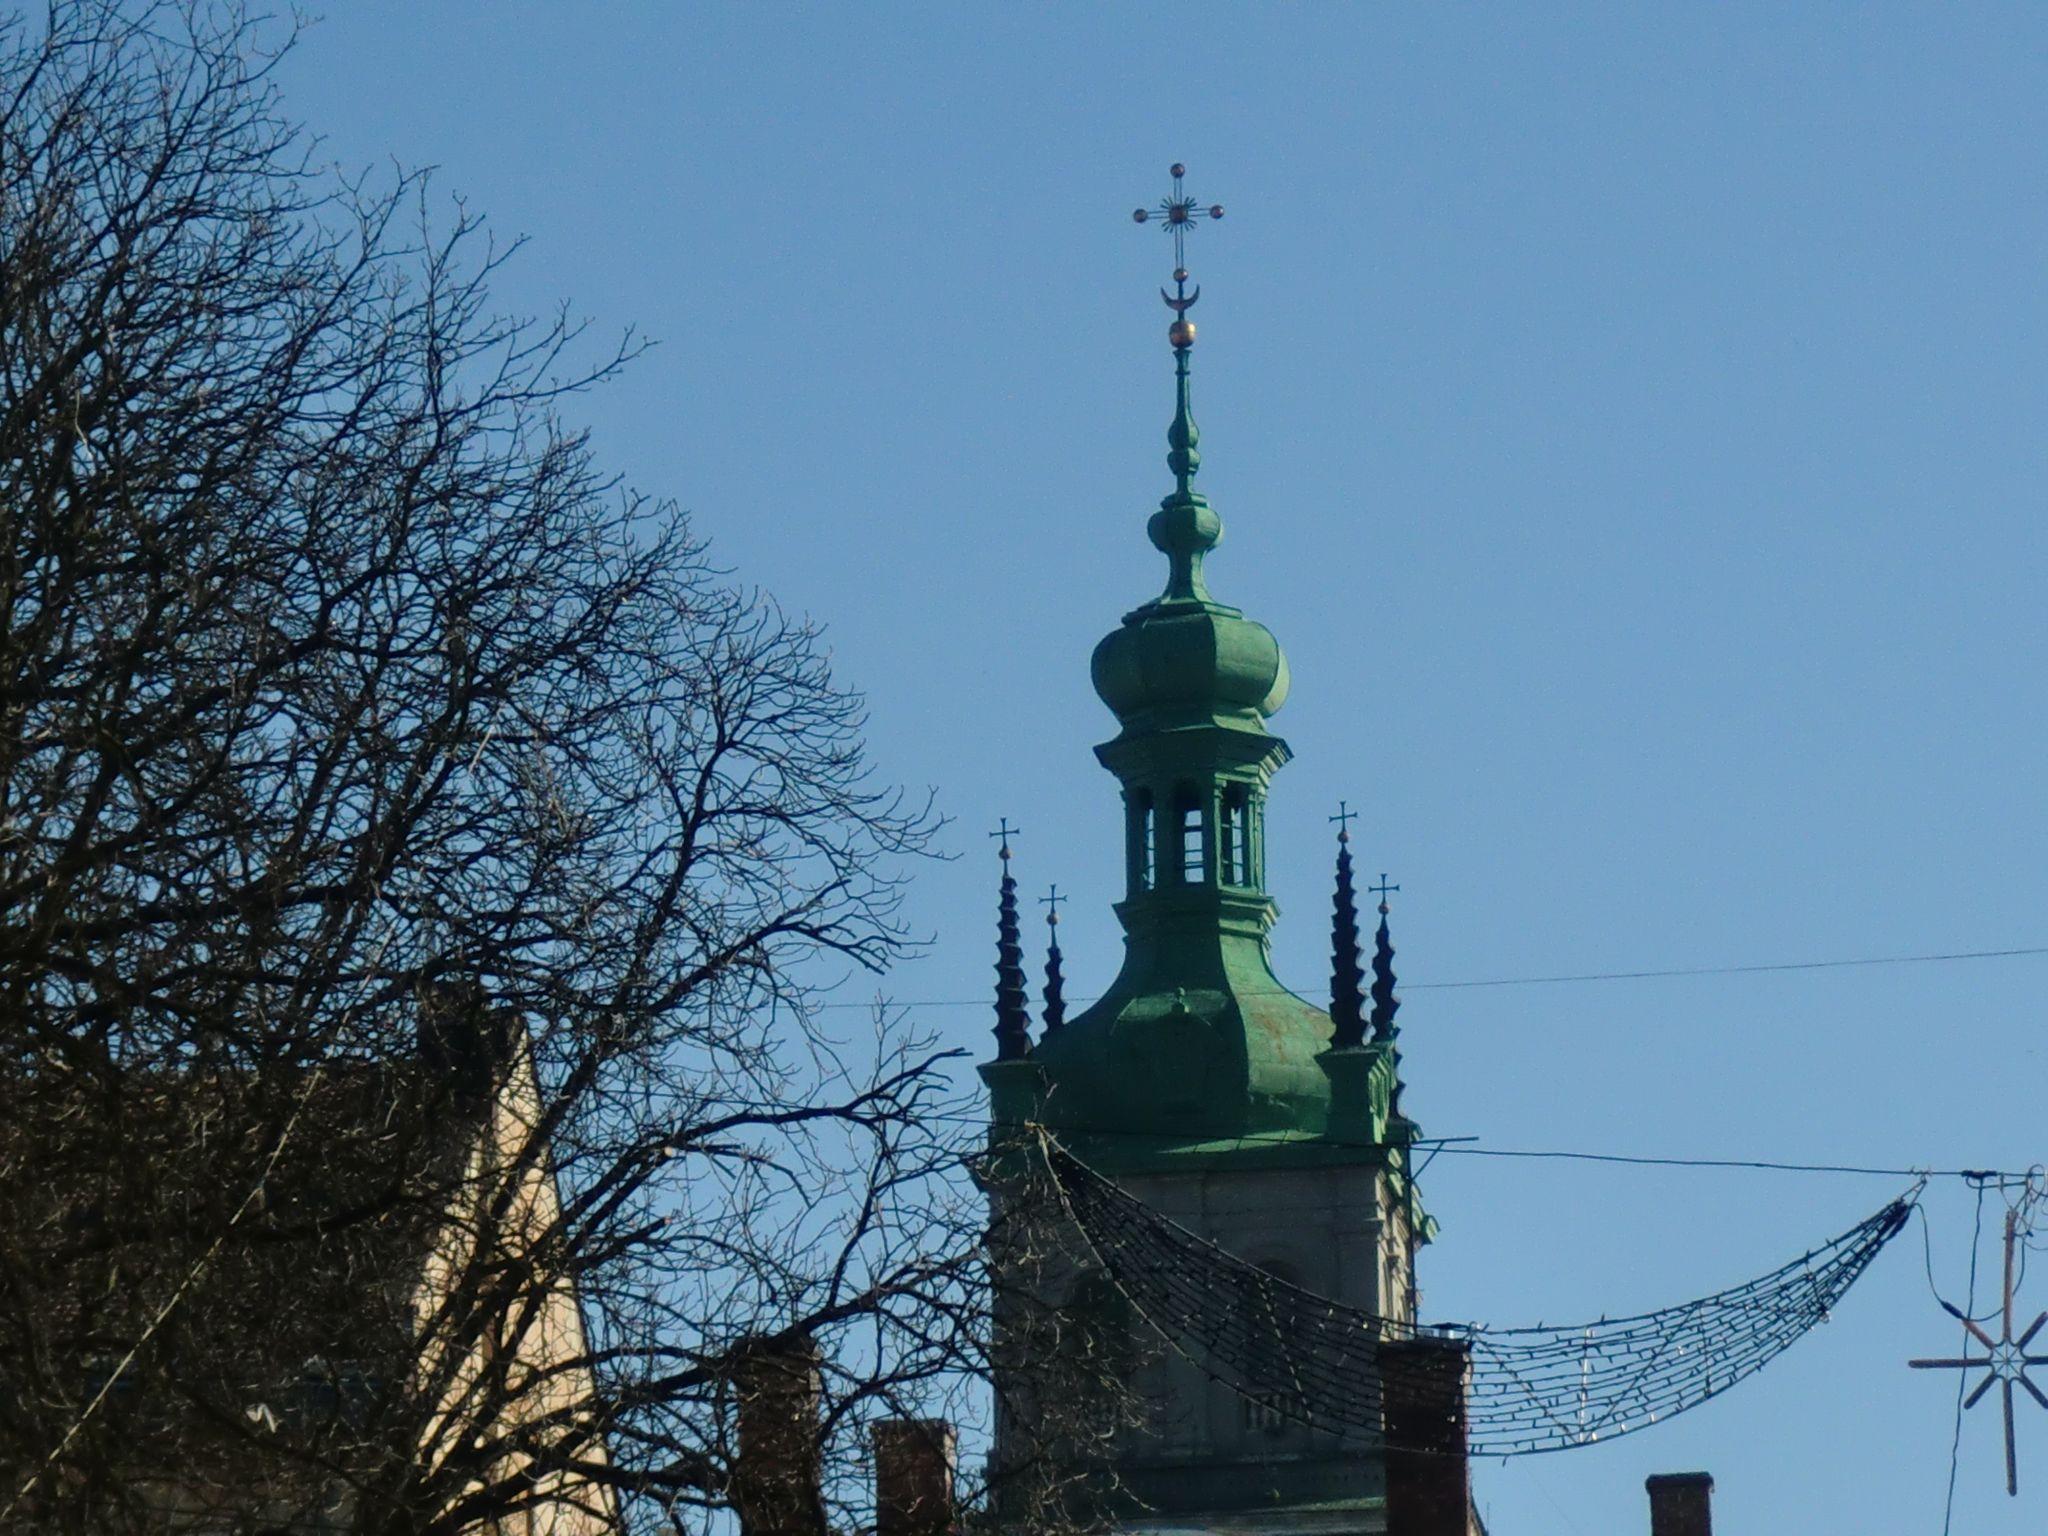 Lviv 22 - Lviv, the Ukrainian pearl